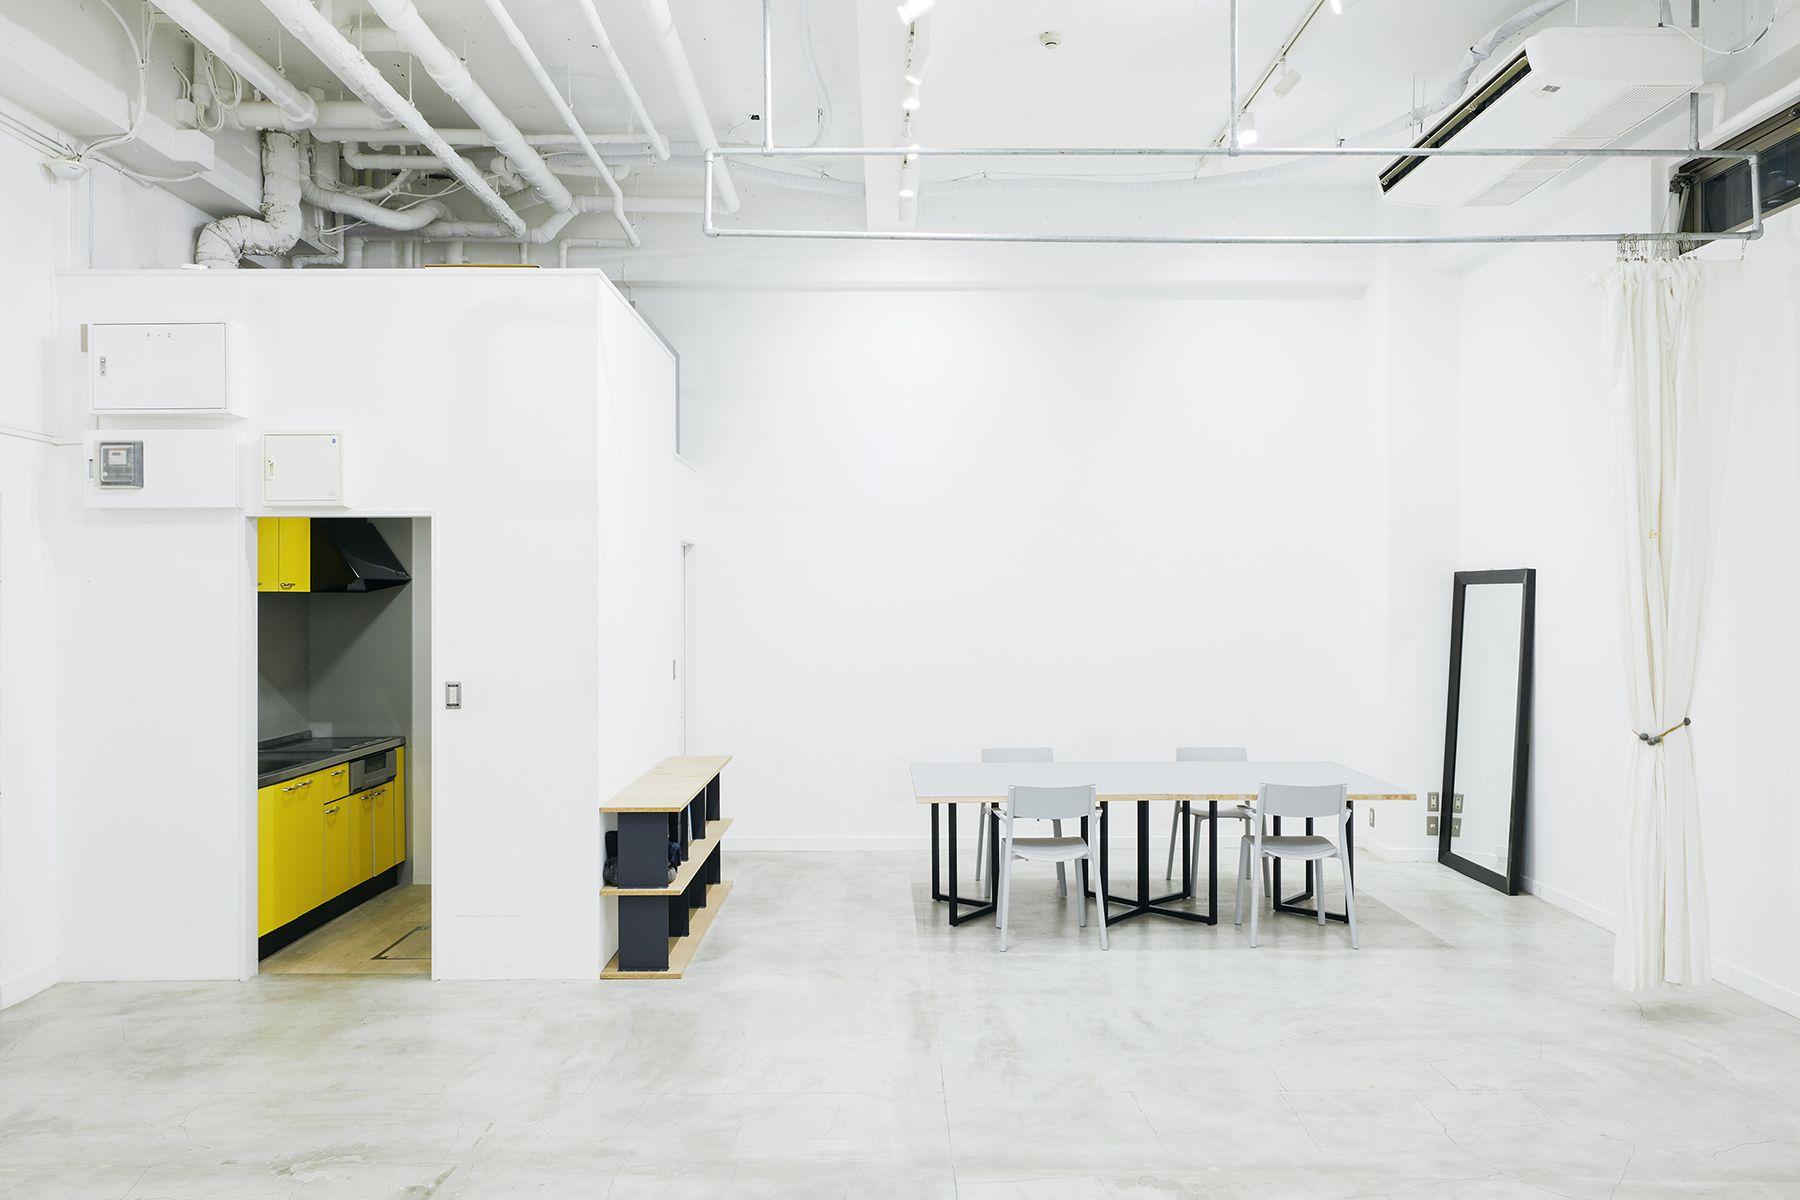 sinca studio 中野坂上 (シンカ スタジオ)くつろげる空間があります